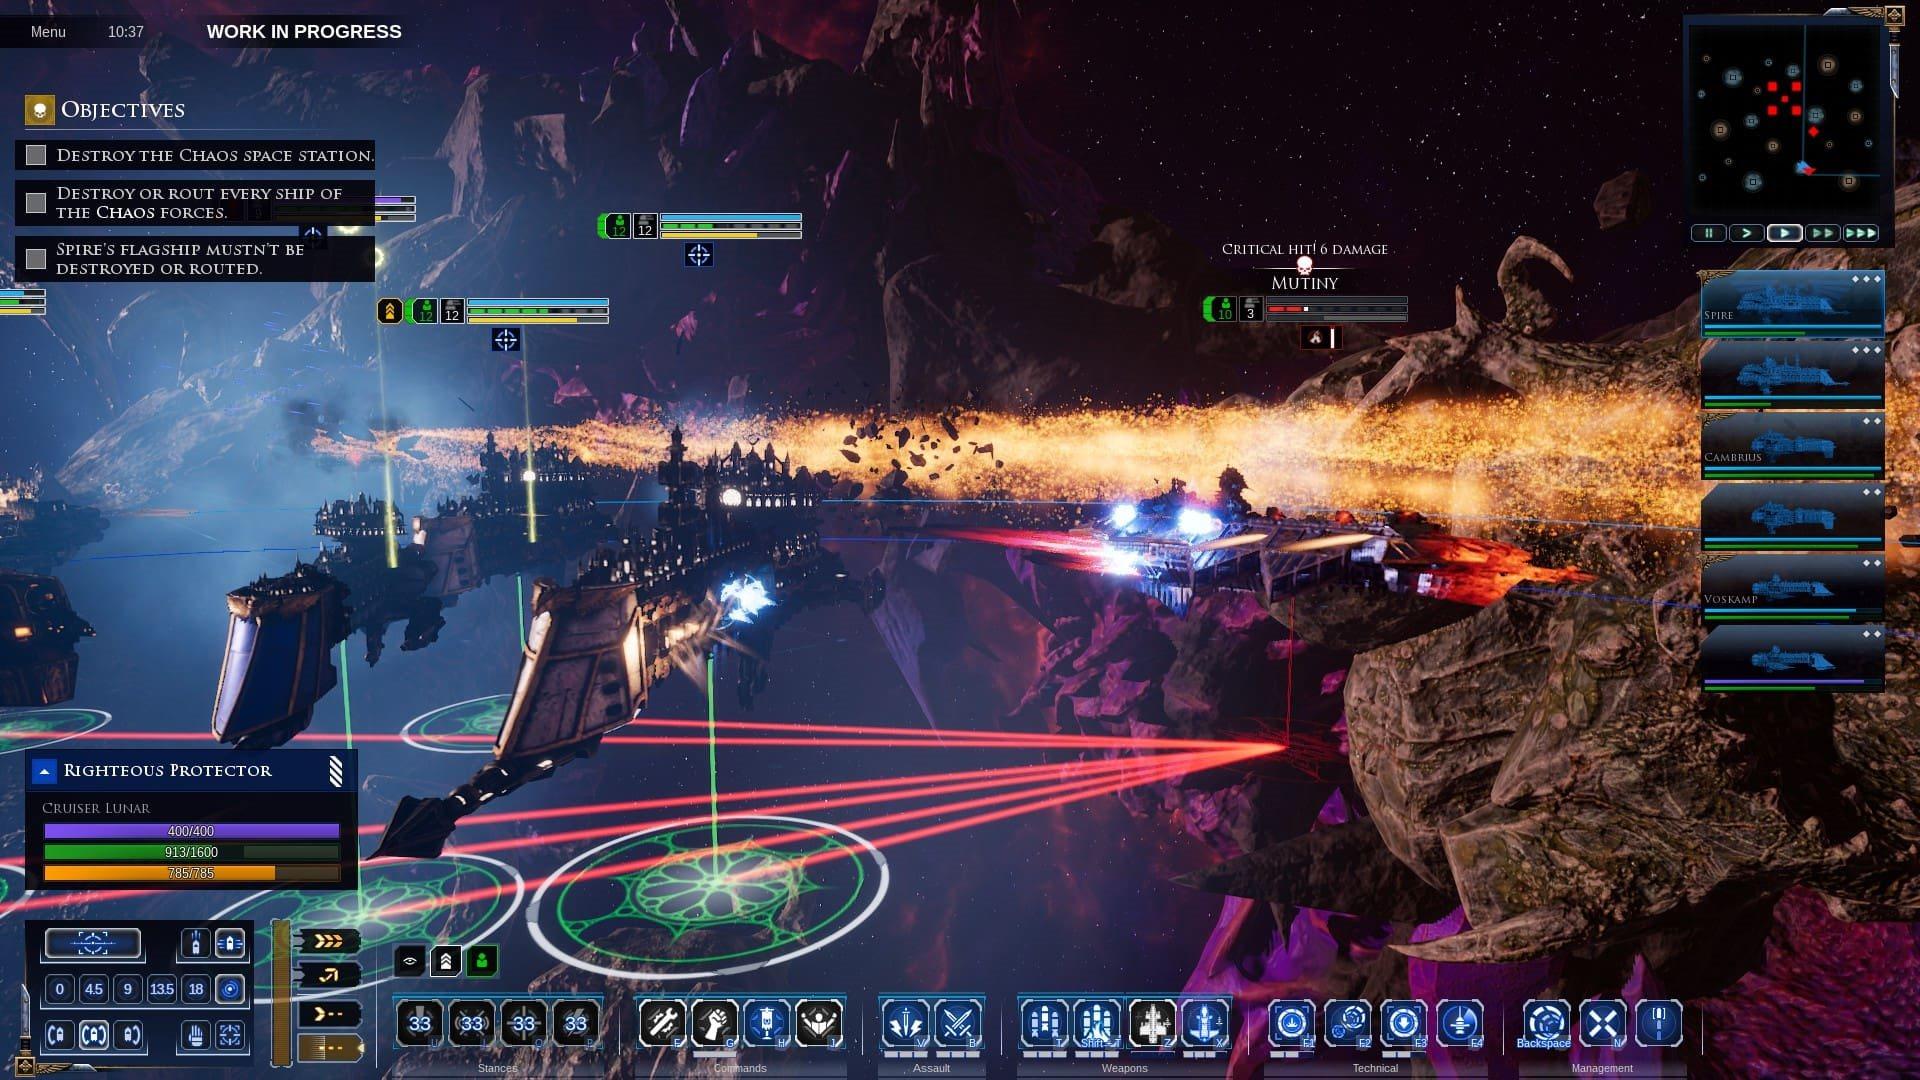 Battlefleet Gothic: Armada 2; screenshot: gameplay